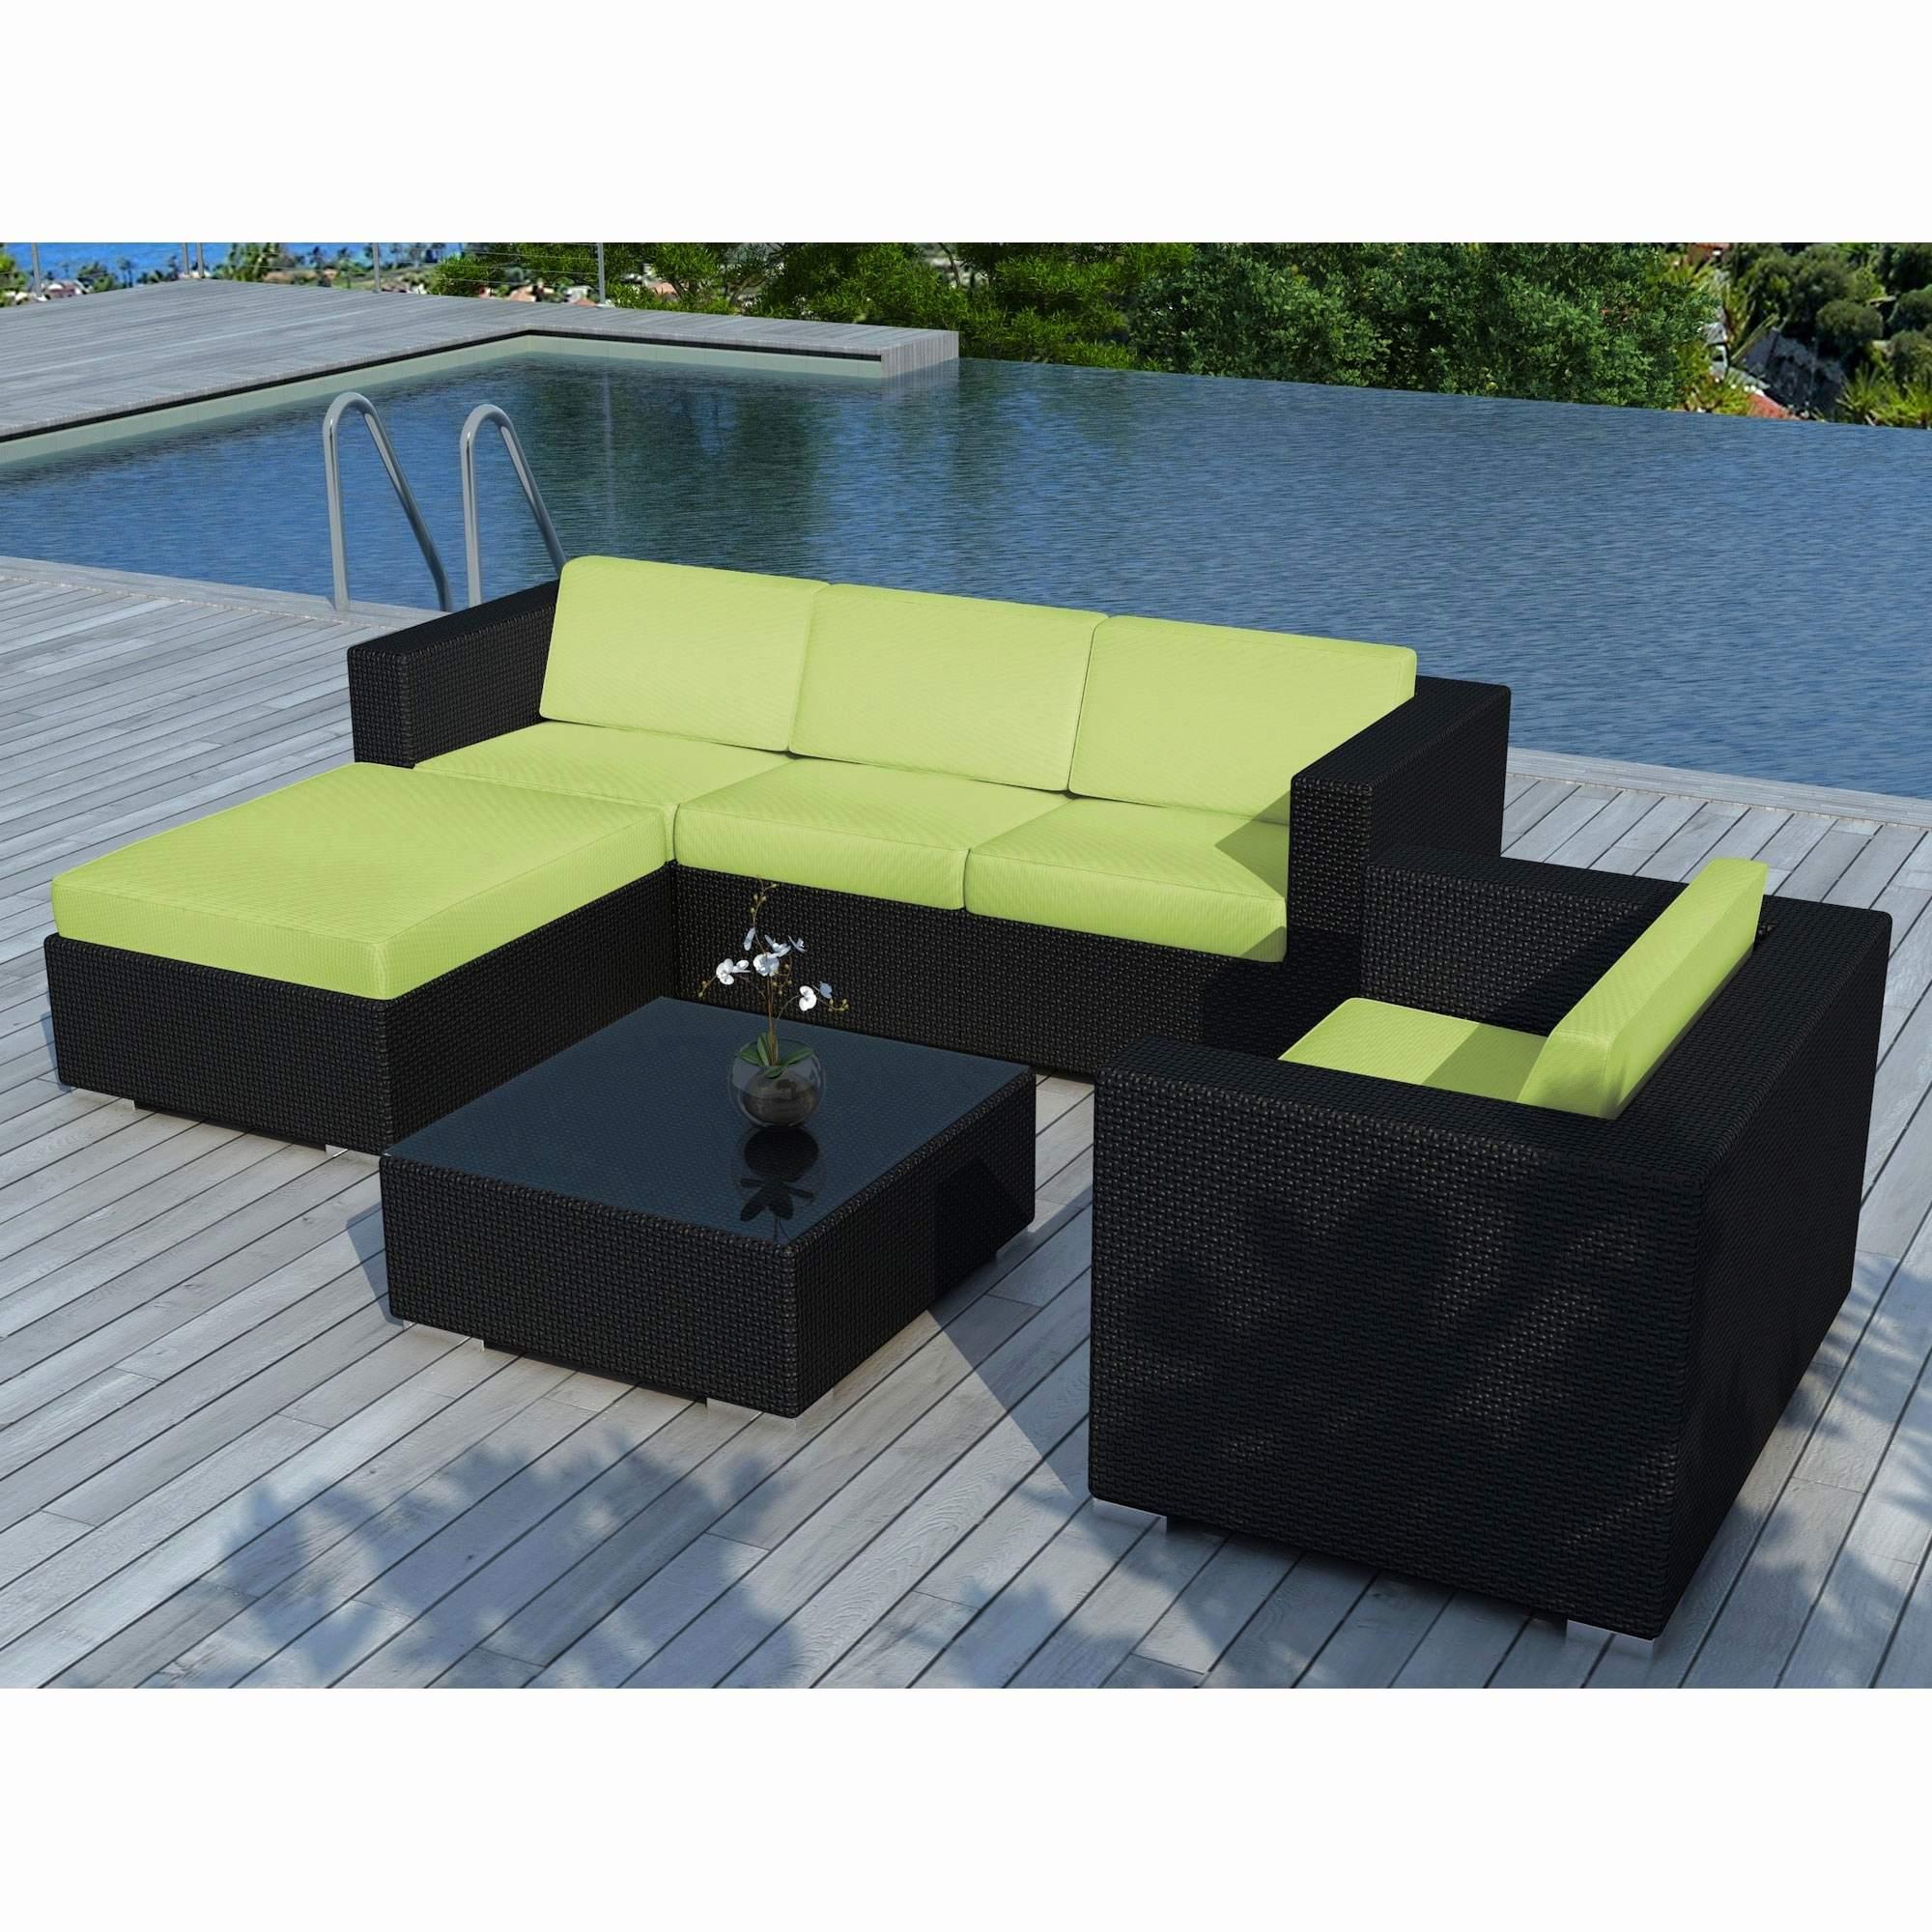 salon de jardin en resine super u jardin. Black Bedroom Furniture Sets. Home Design Ideas